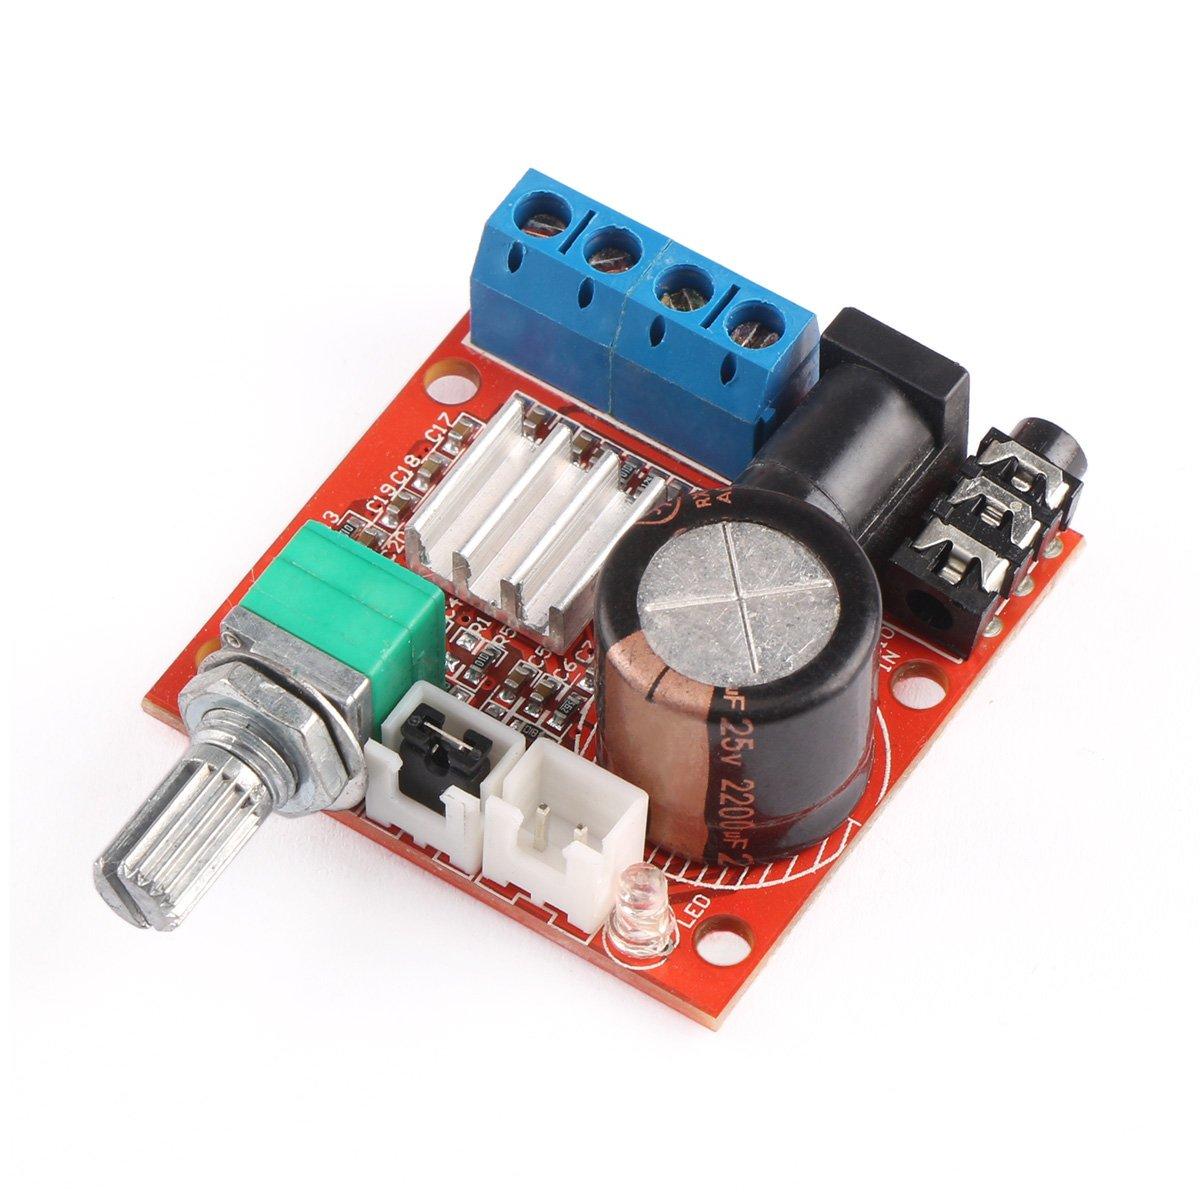 Best Portable Amplifiers For Headphones How To Build Headphone Class A Amplifier 12 Volt Board Drok Pam8610 Mini Stereo Amp 10w Digital Audio Amplify Circuit D 12v Dc Low Power Ampli Module Dual Channel